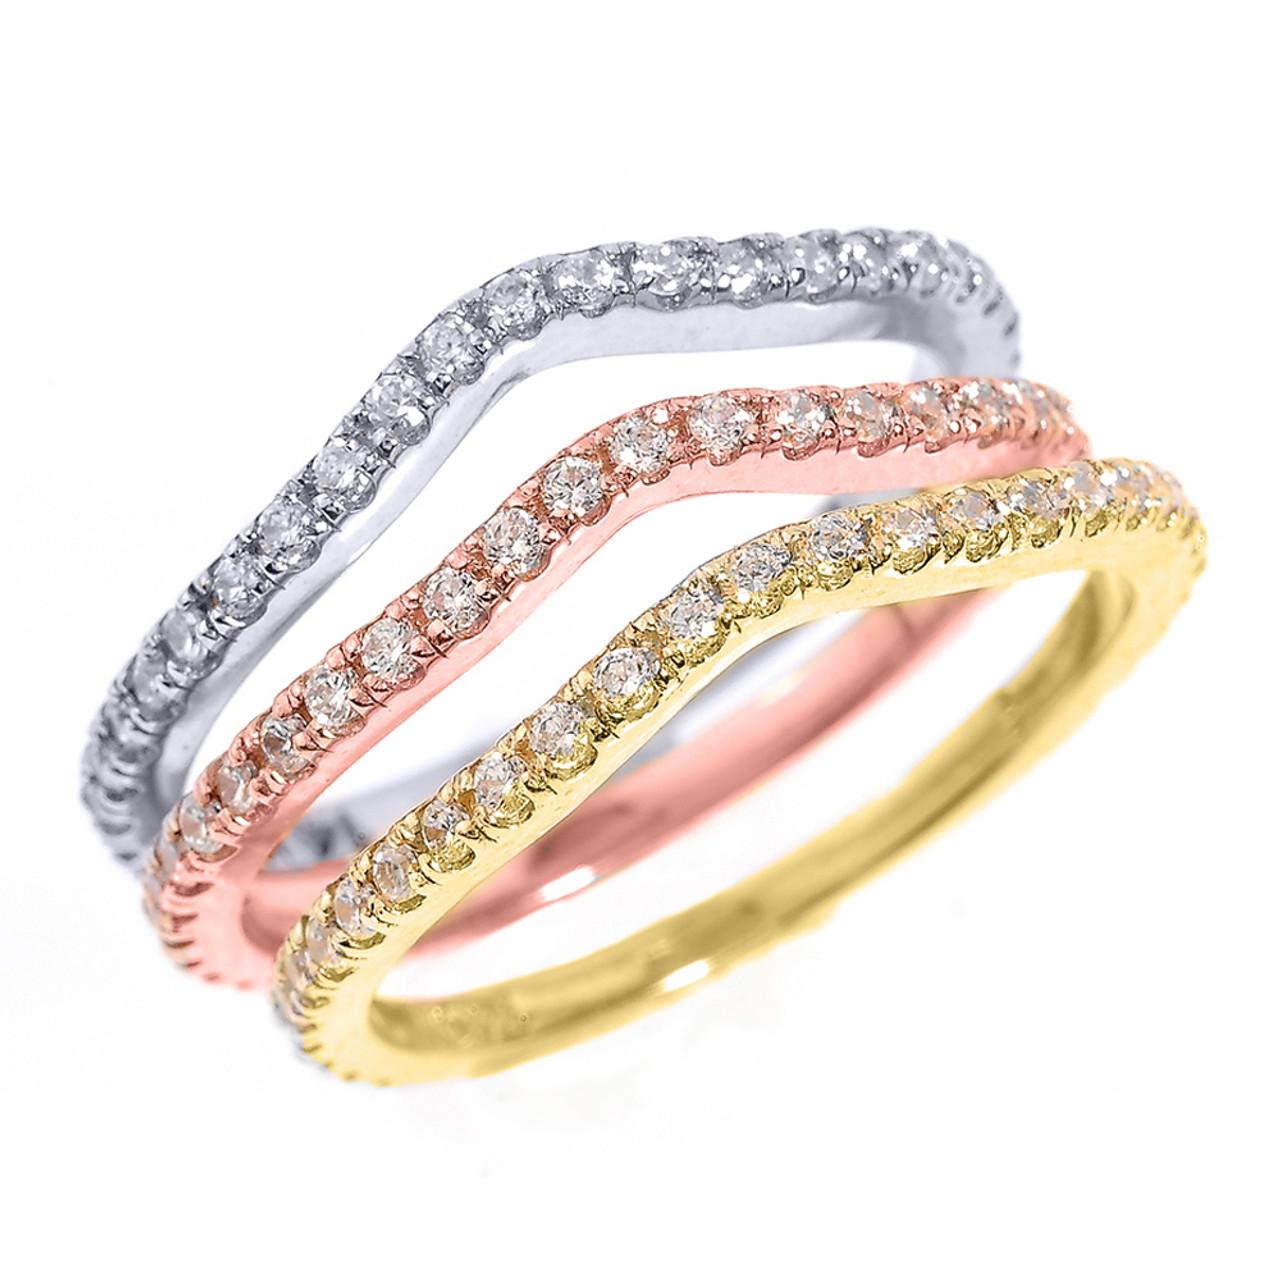 14k tri color gold chevron diamond stackable 3 piece wedding ring set - 3 Piece Wedding Ring Set